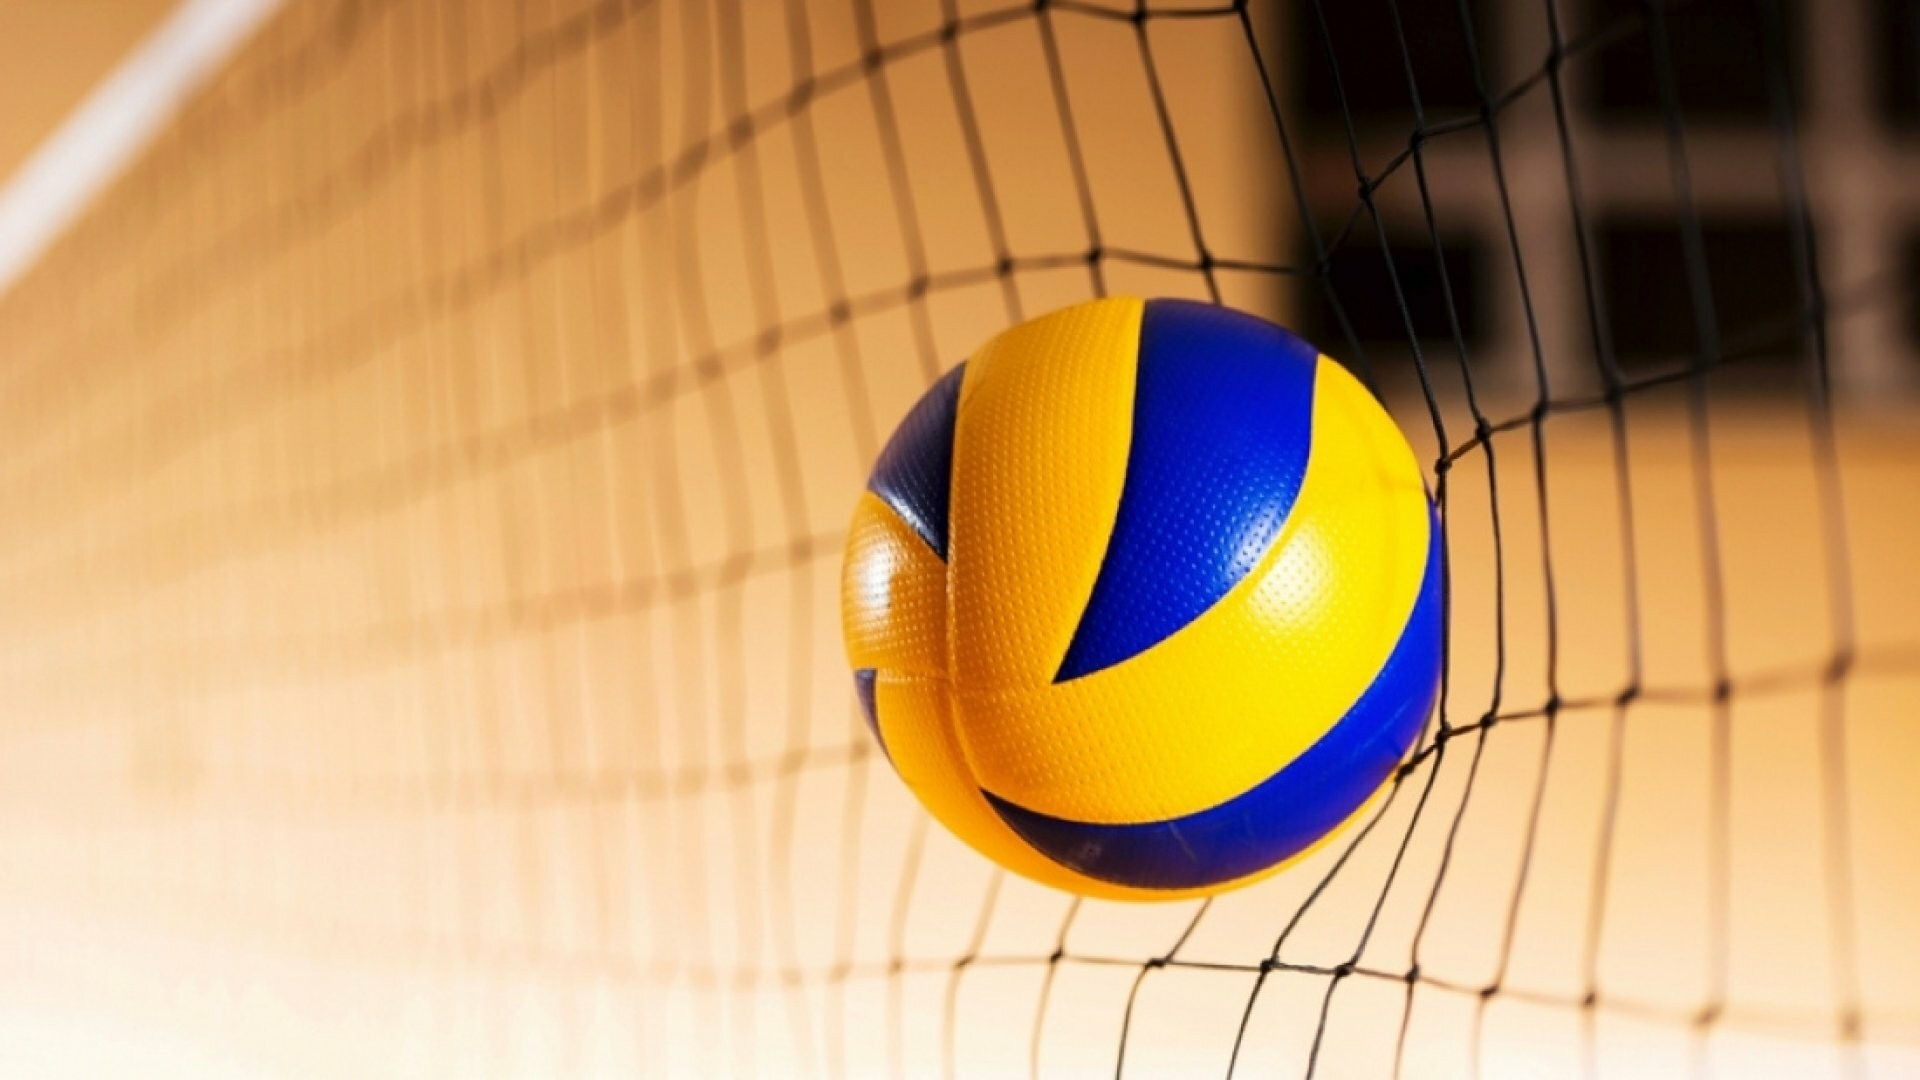 Volleyball Full HD Wallpaper